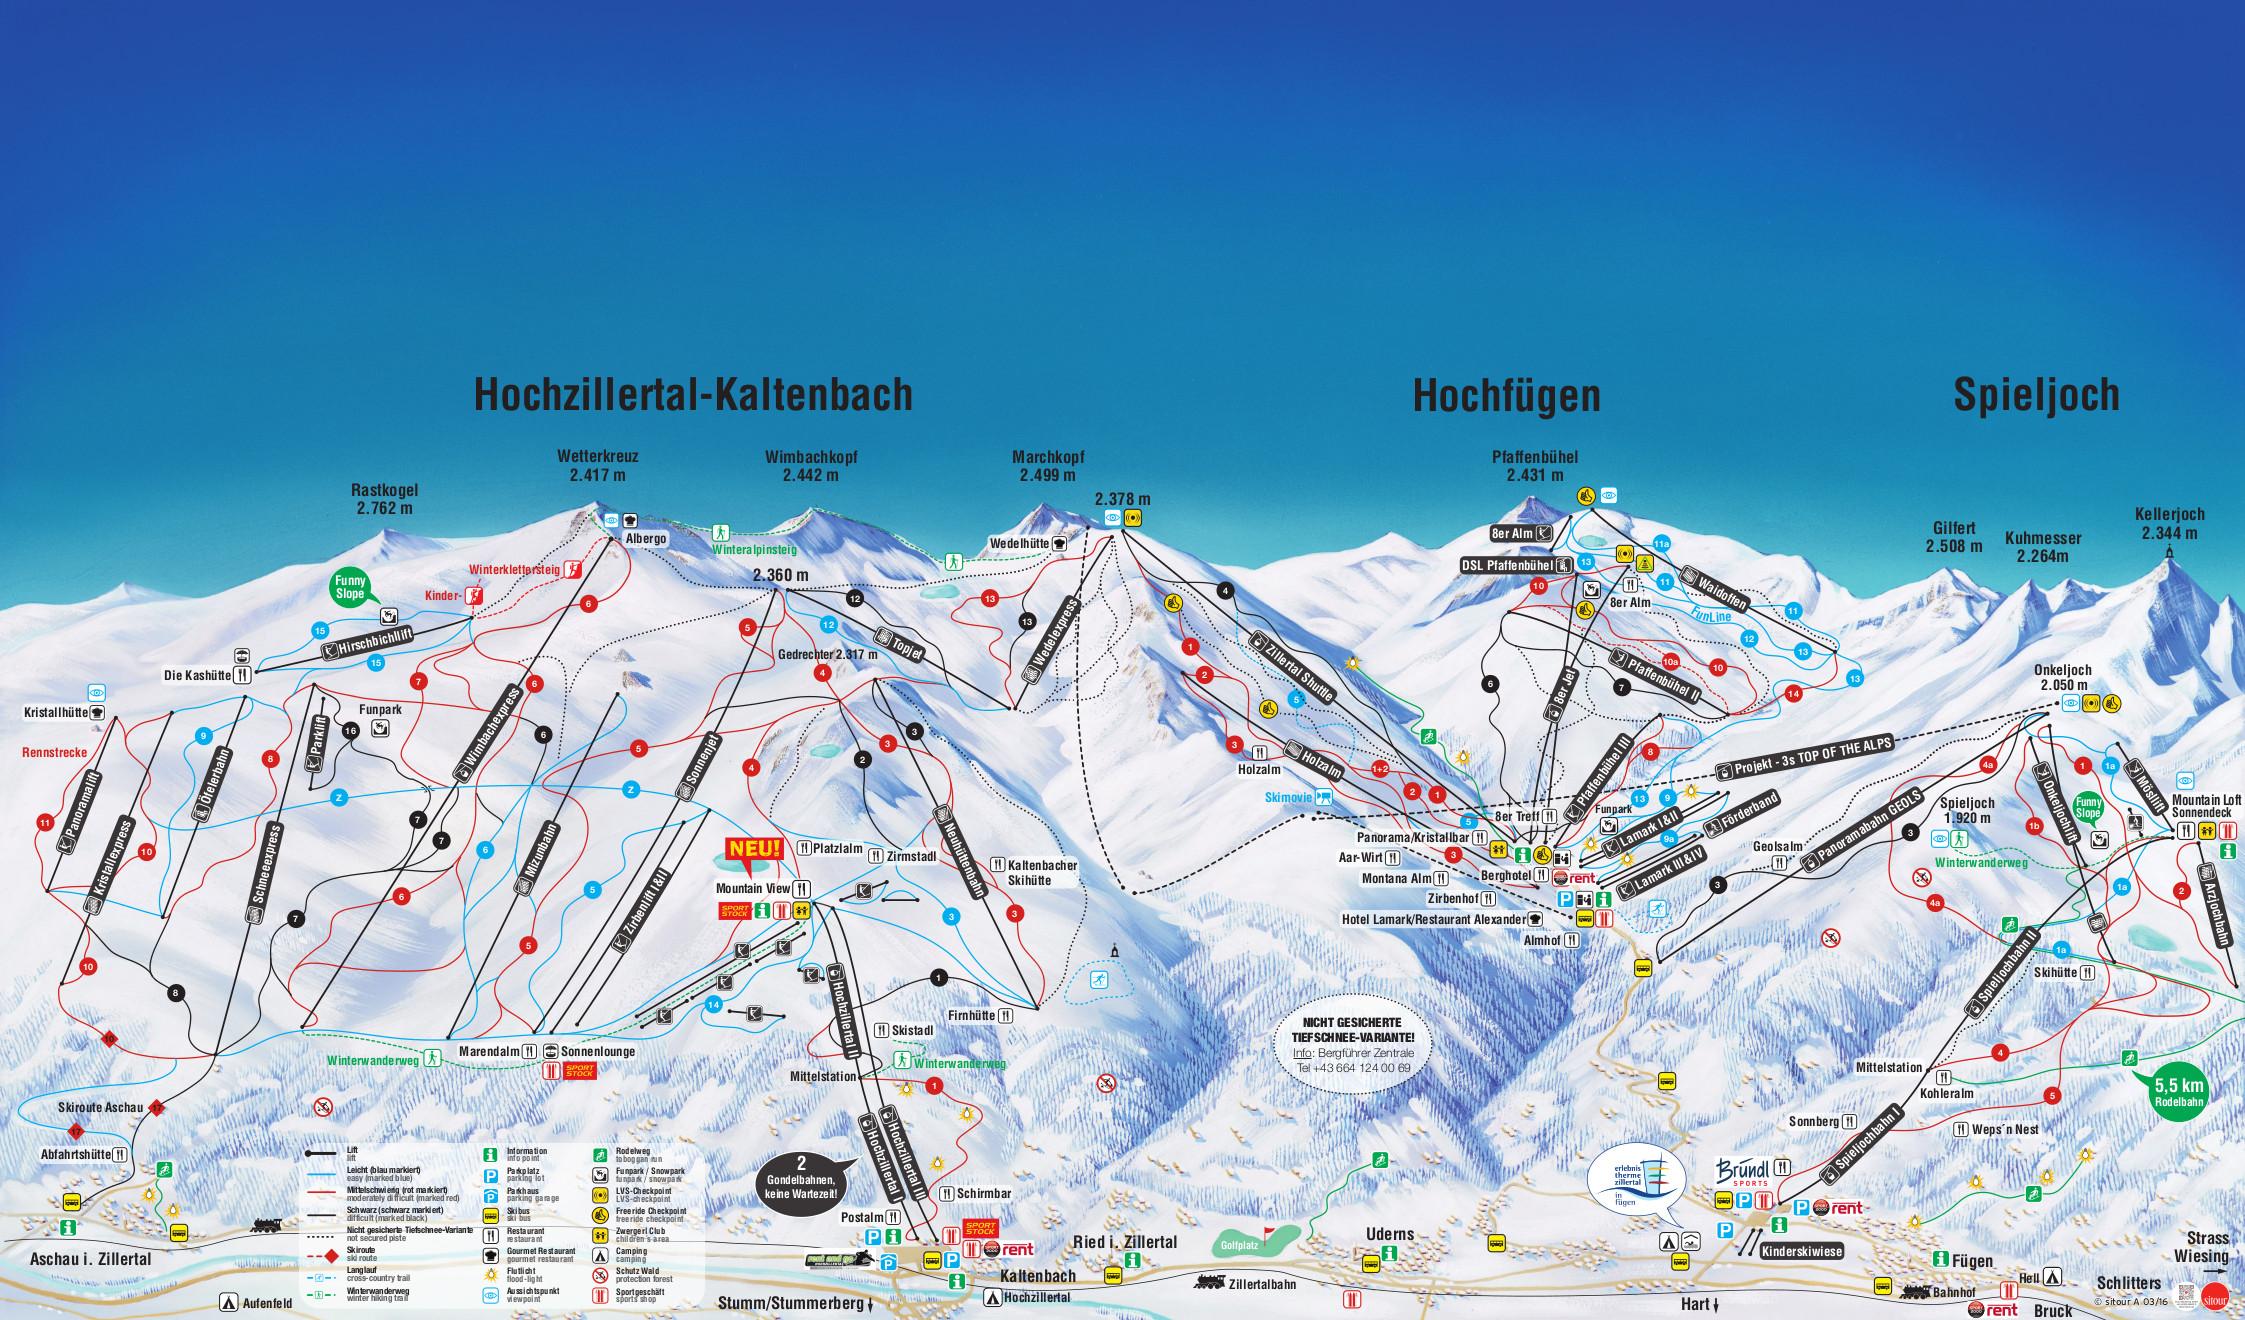 Hochzillertal-Kaltenbach Piste / Trail Map